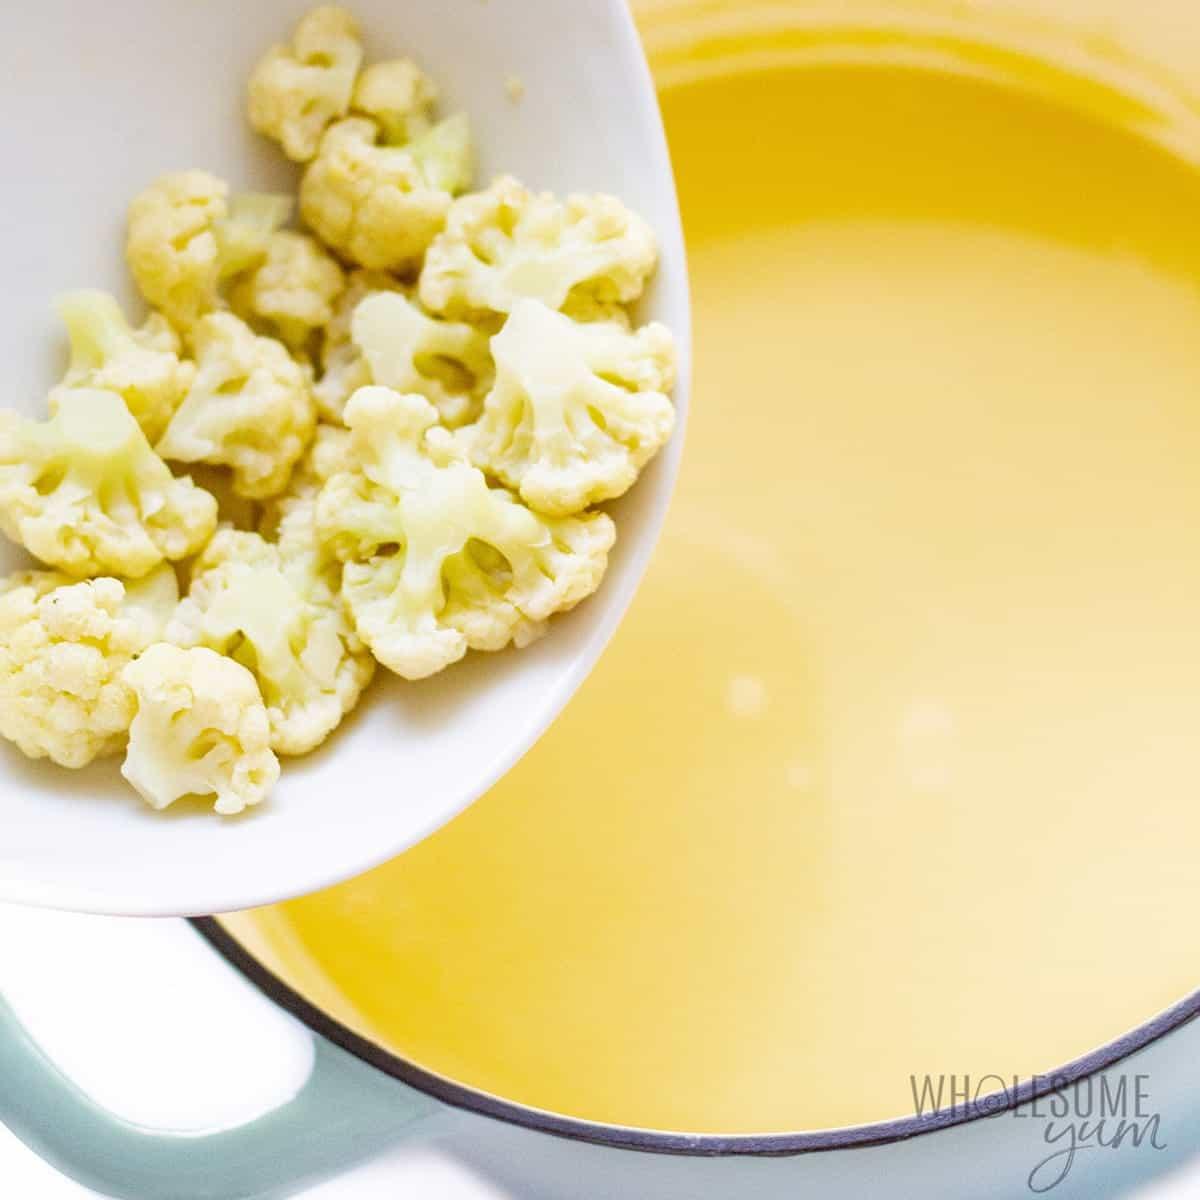 Putting cauliflower back into soup